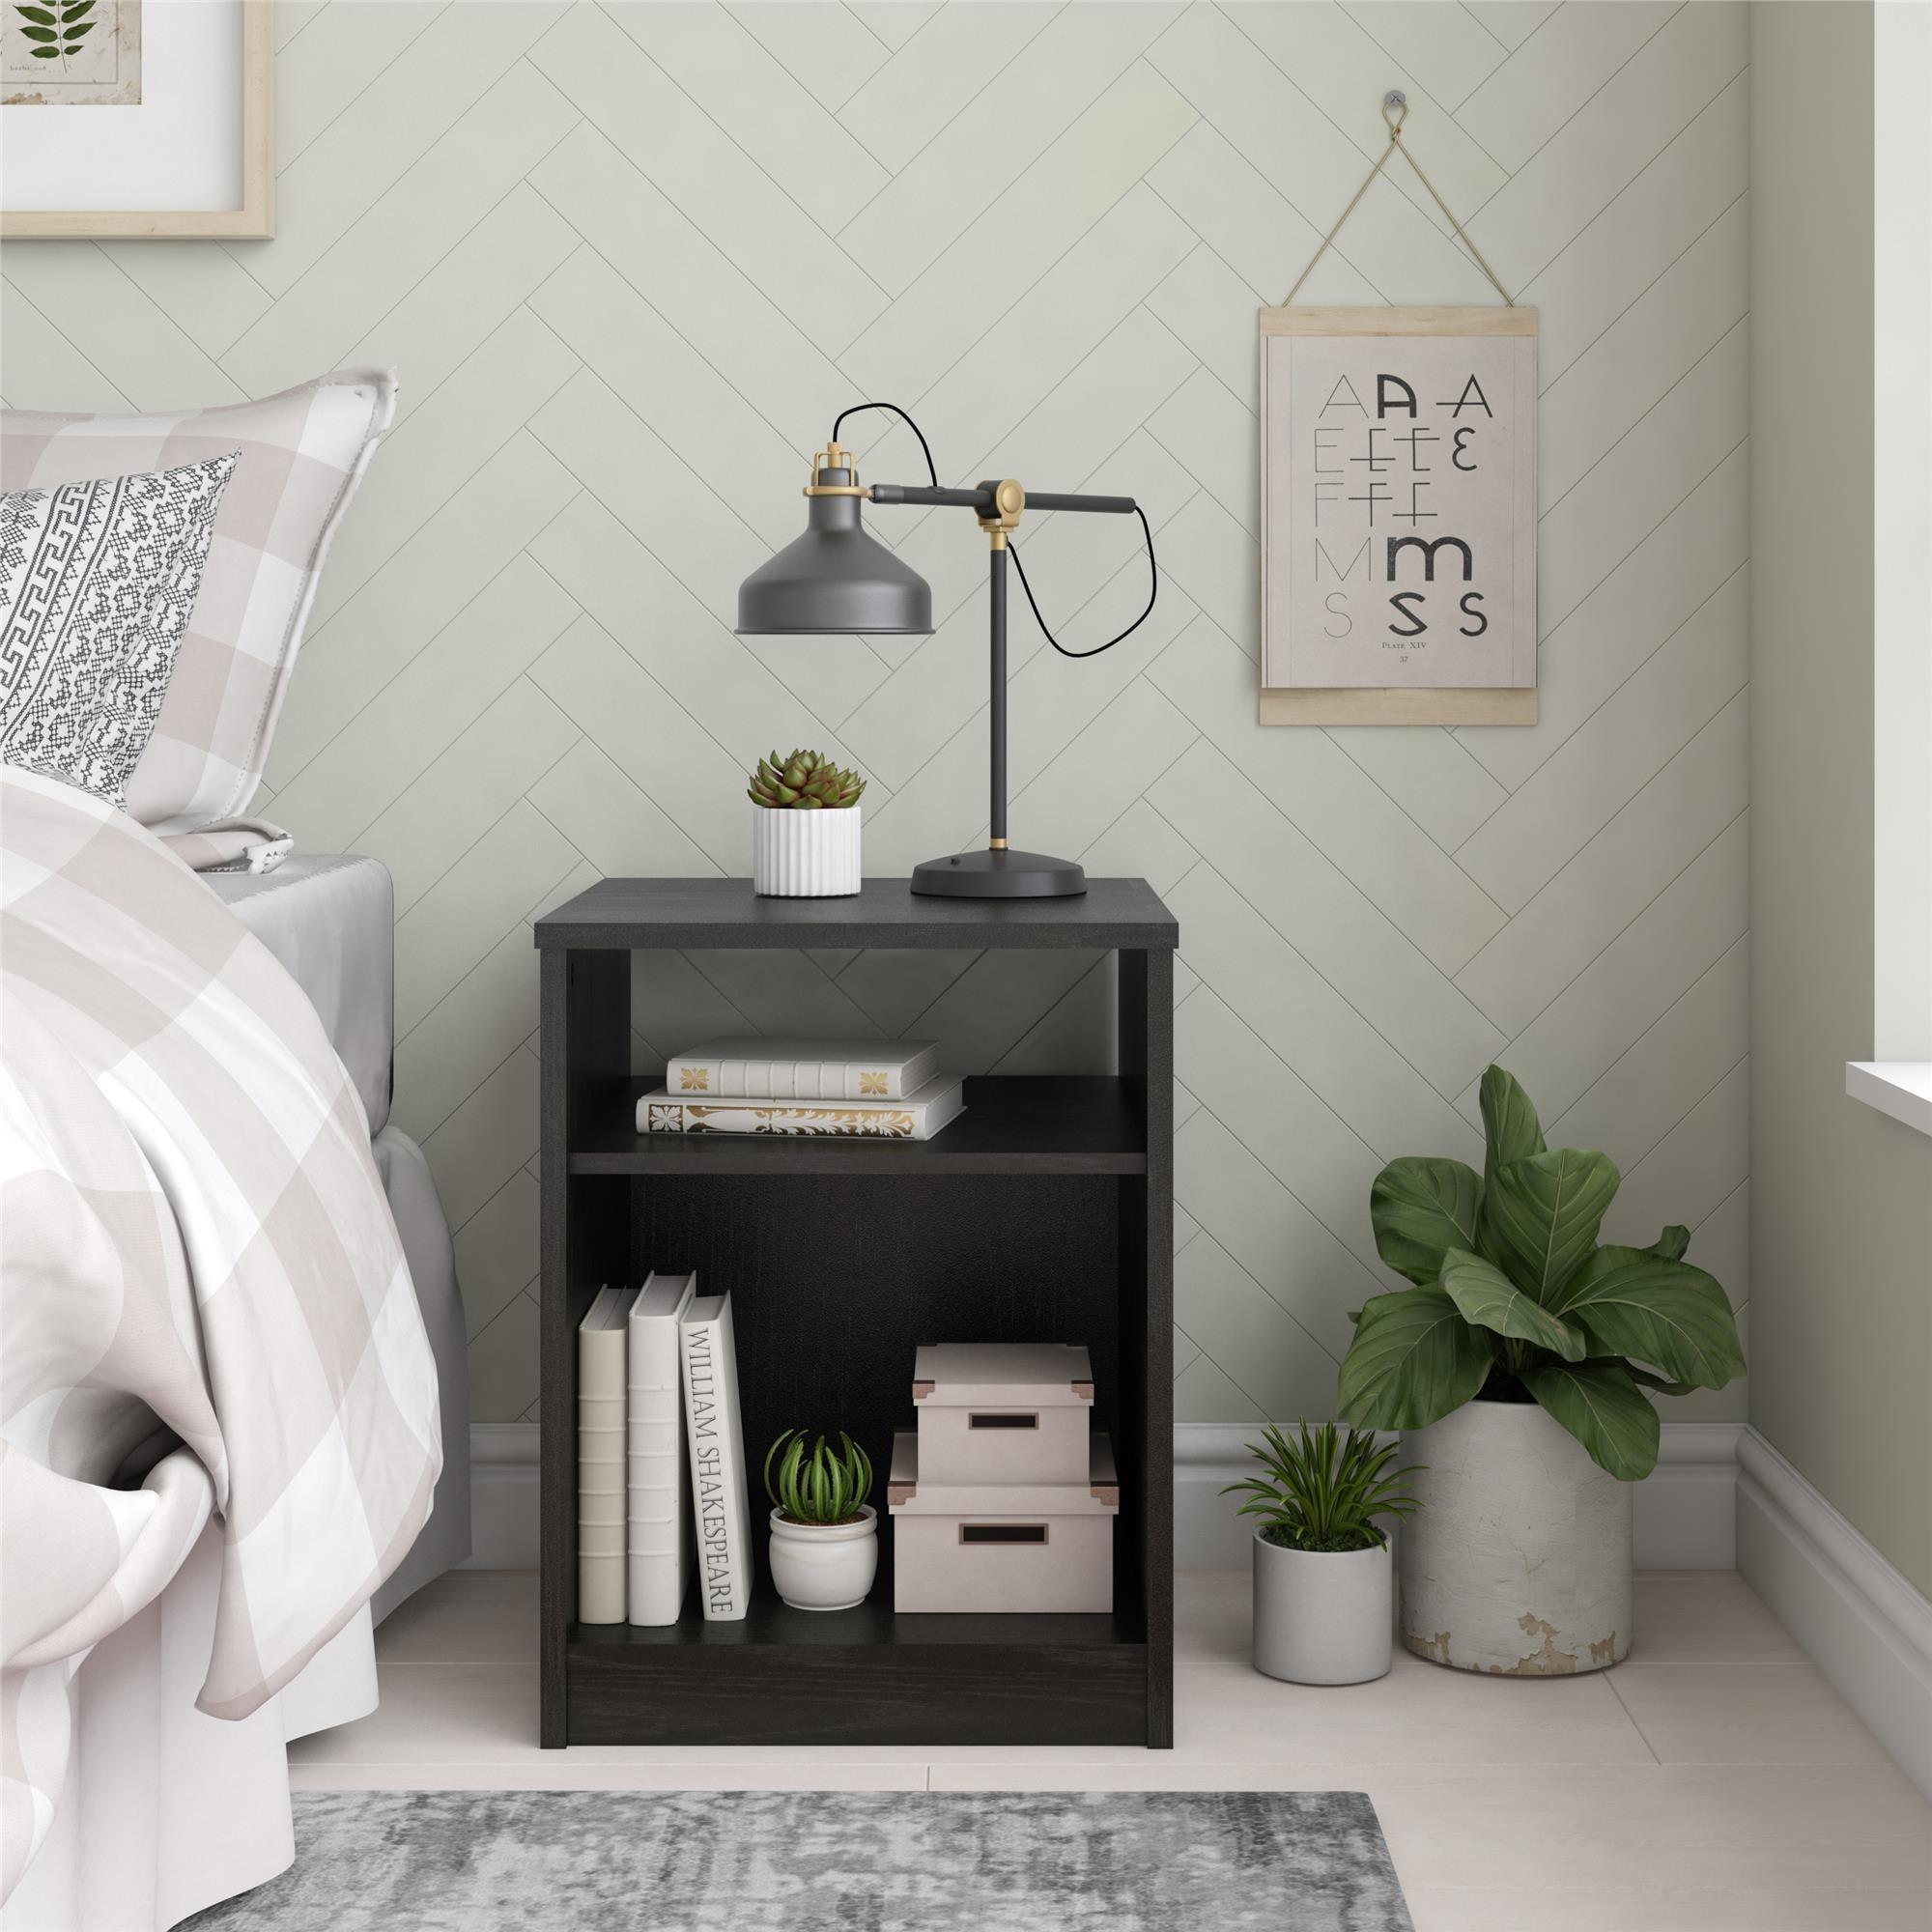 the two-shelf nightstand in black